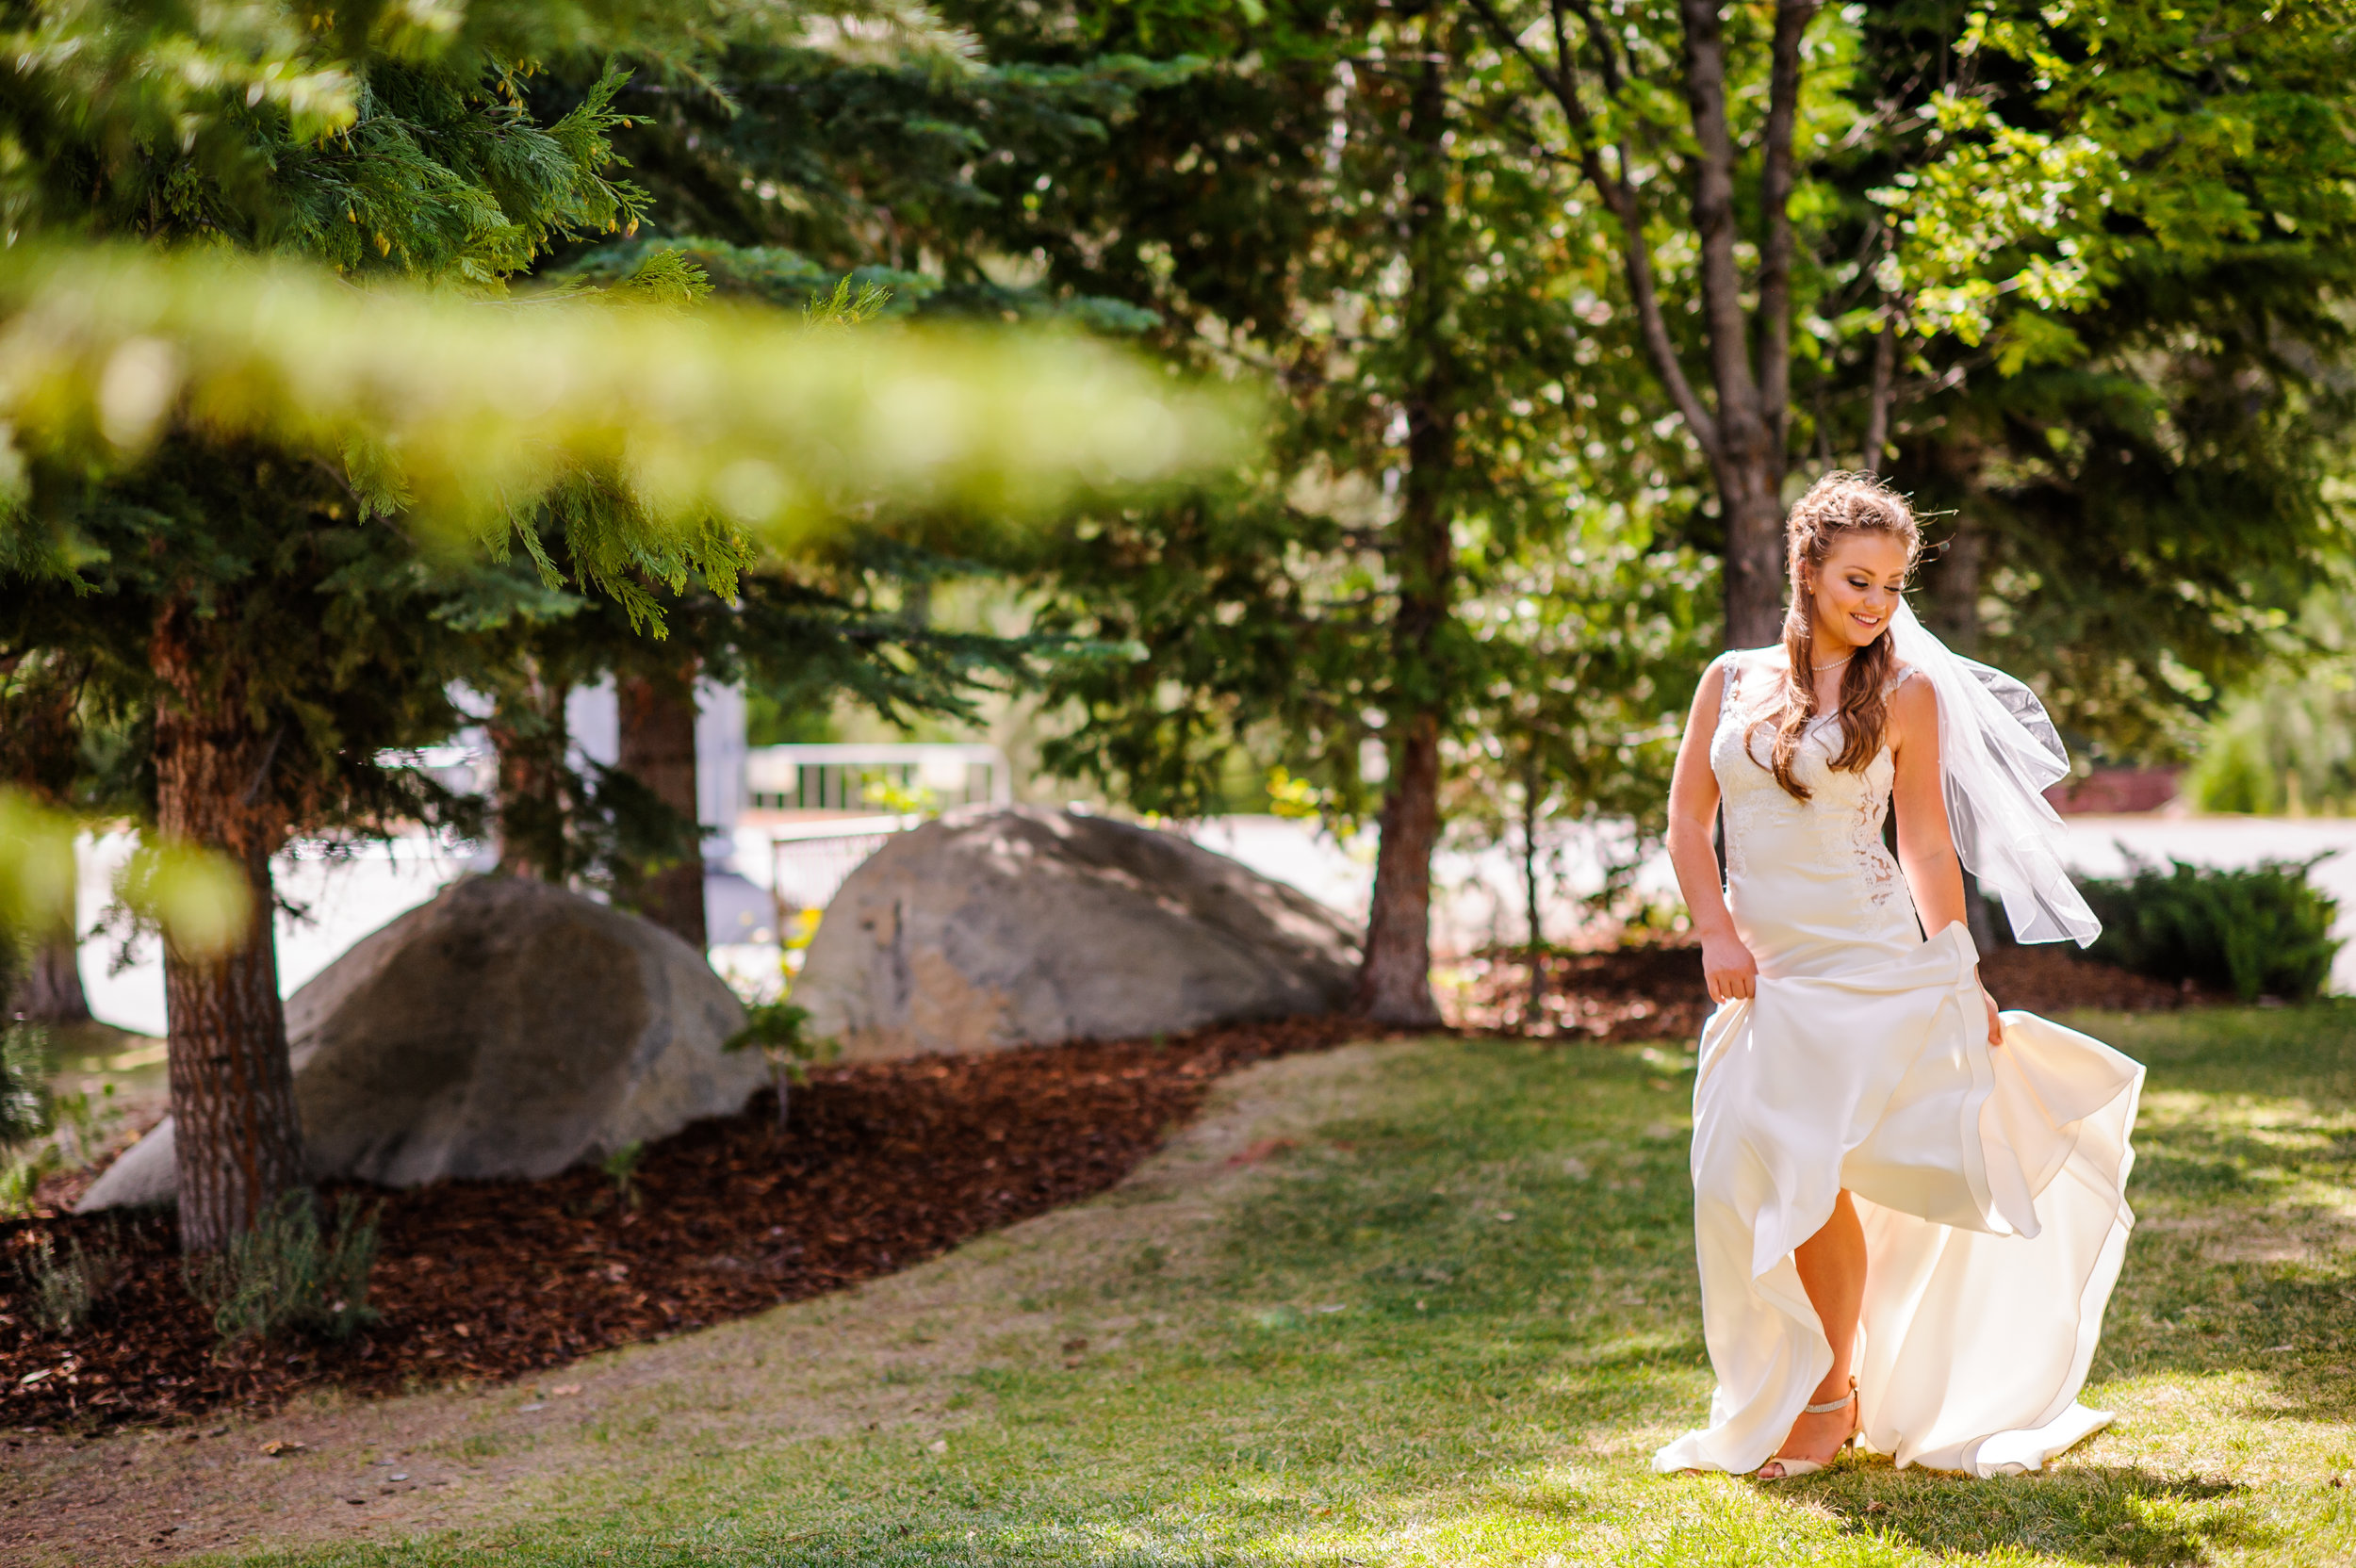 becca-jacob-023-tenaya-lodge-yosemite-wedding-photographer-katherine-nicole-photography.JPG